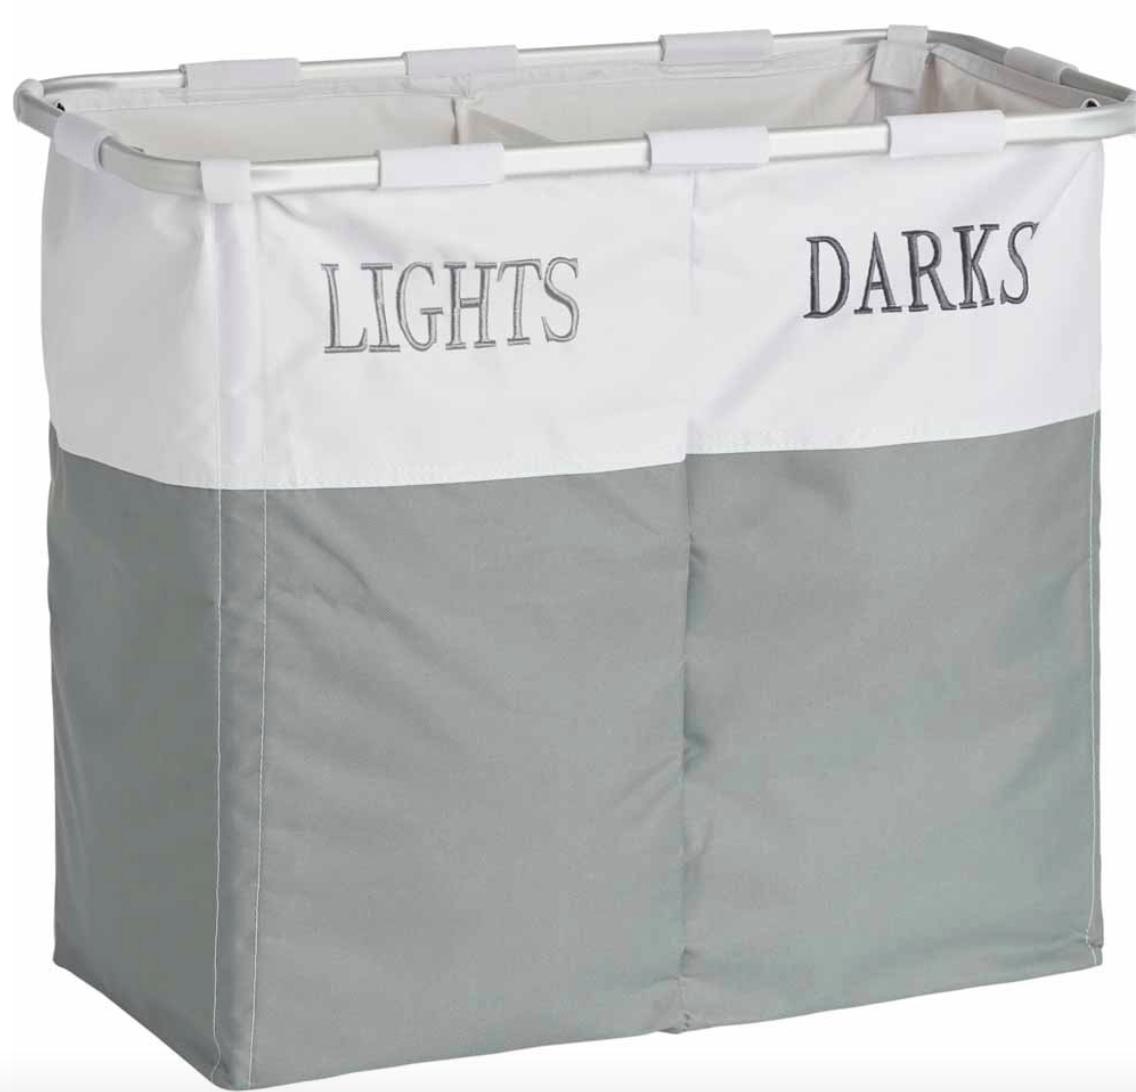 Wilko Lights Darks Laundry Hamper £10 (+£2 Delivery) @ Wilko